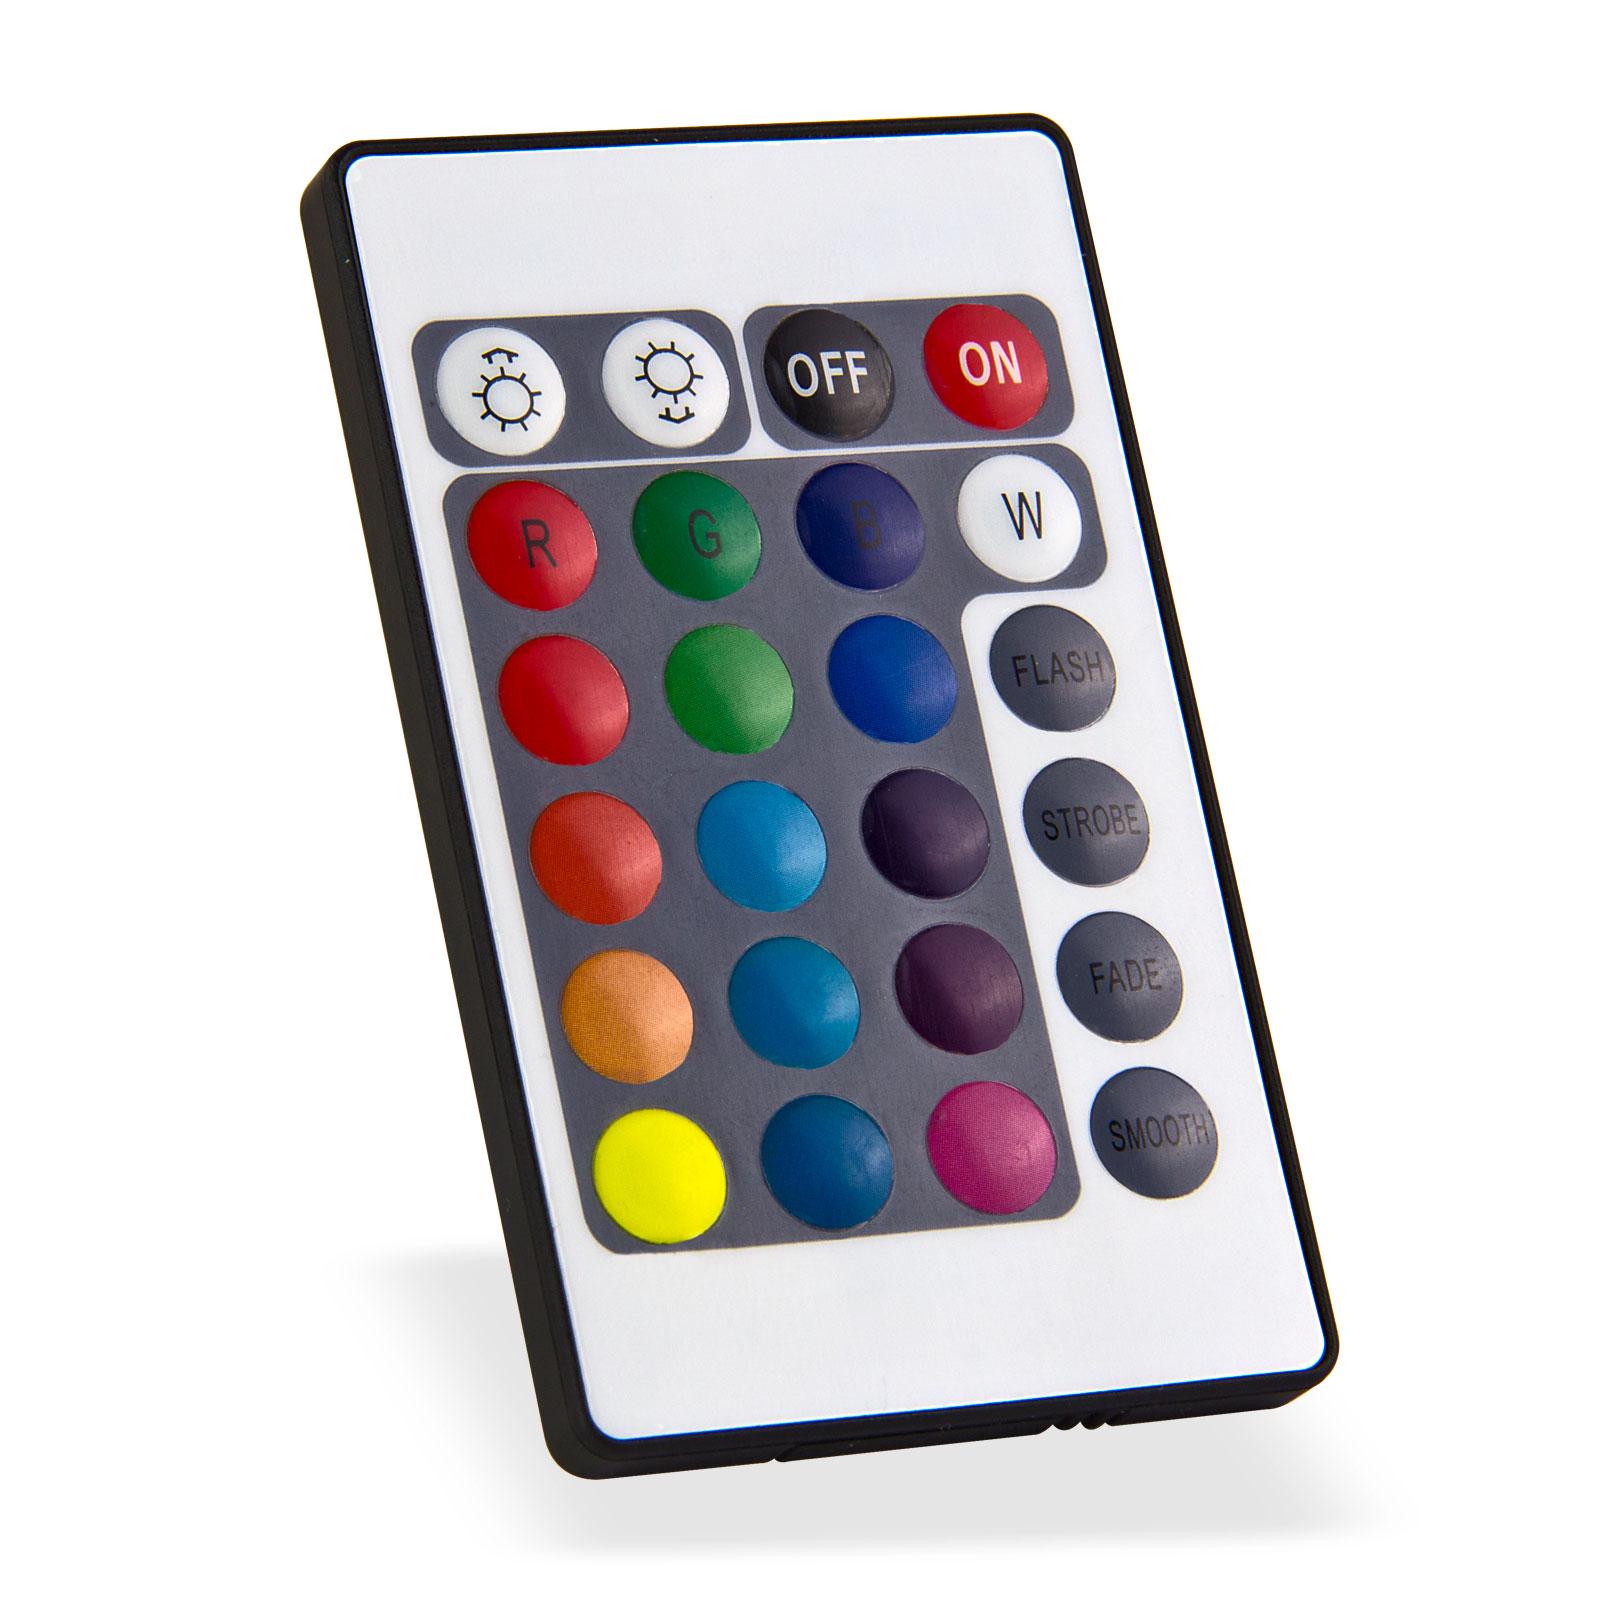 led strahler leuchte bunt 20 w wei 15 farben 4 programme mit fernbedienung. Black Bedroom Furniture Sets. Home Design Ideas